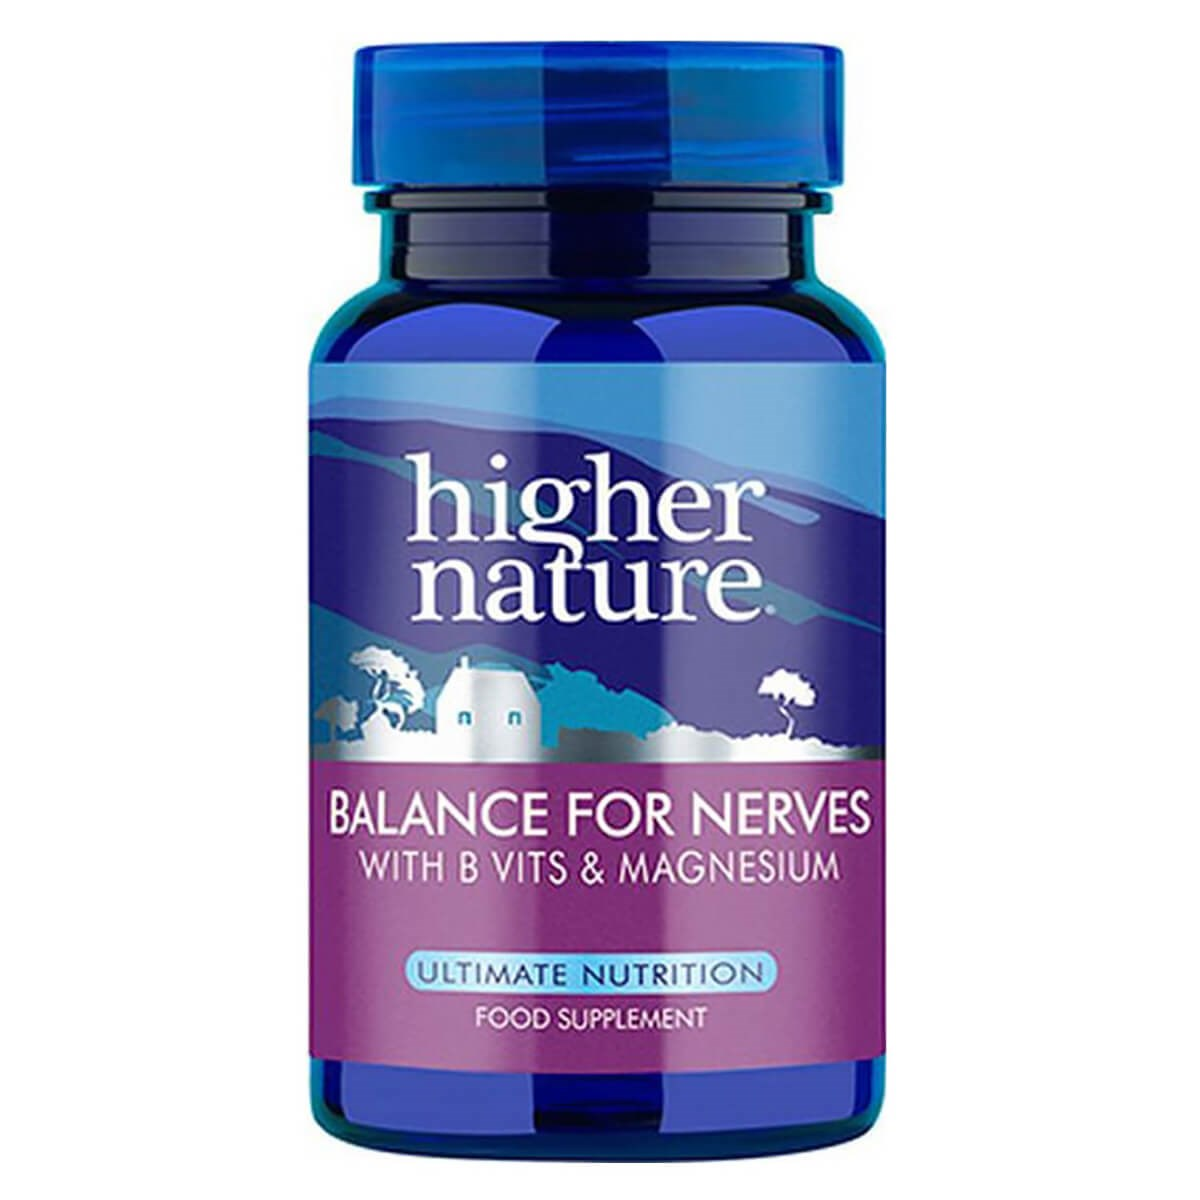 Higher Nature Balance For Nerves